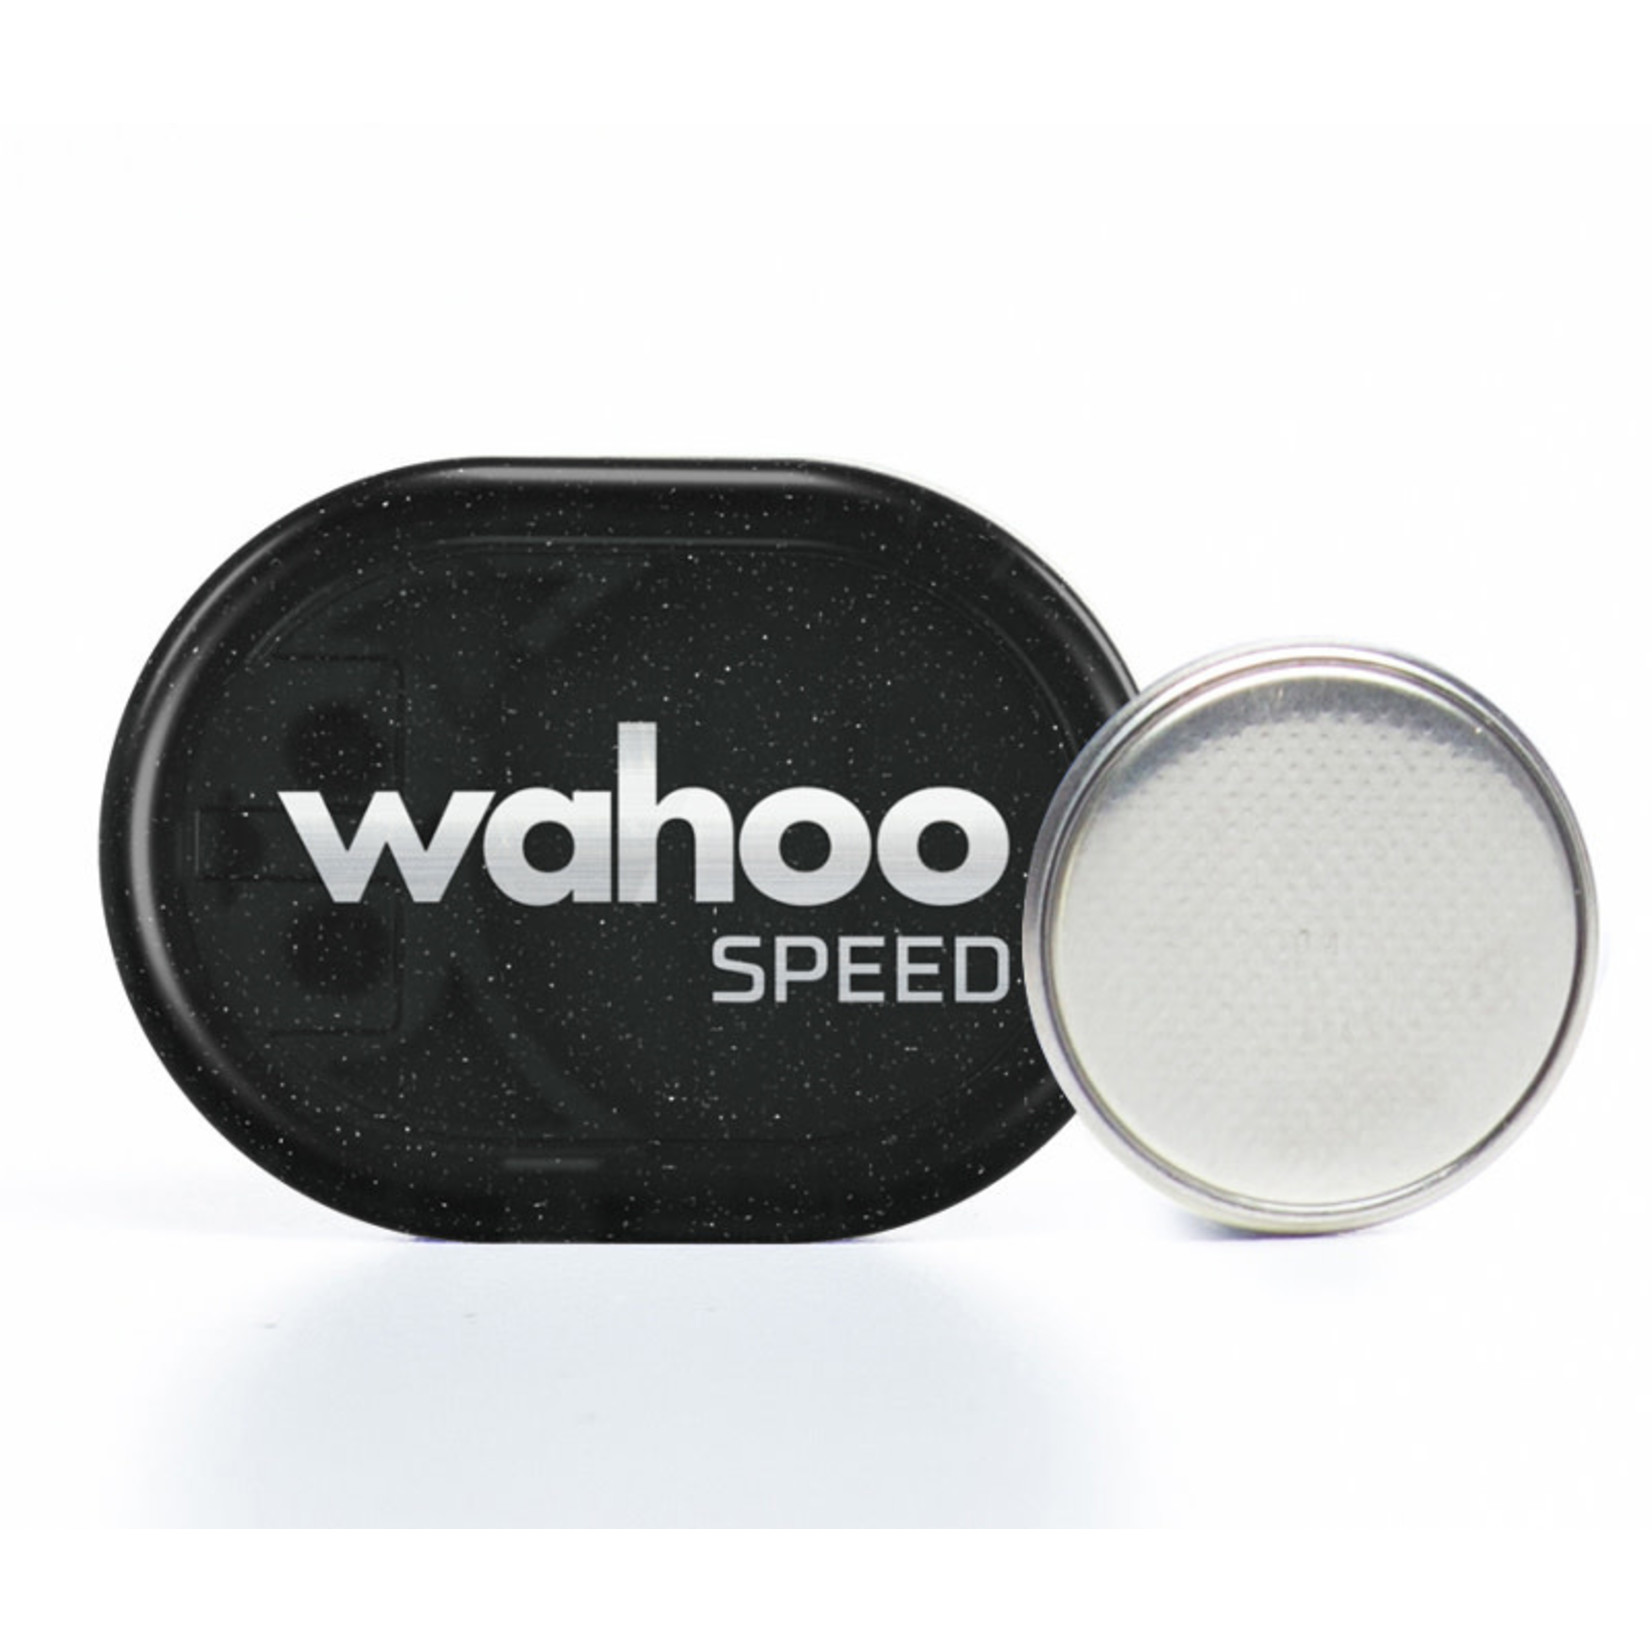 Wahoo WAHOO RPM SPEED SENSOR BLUETOOTH & ANT+